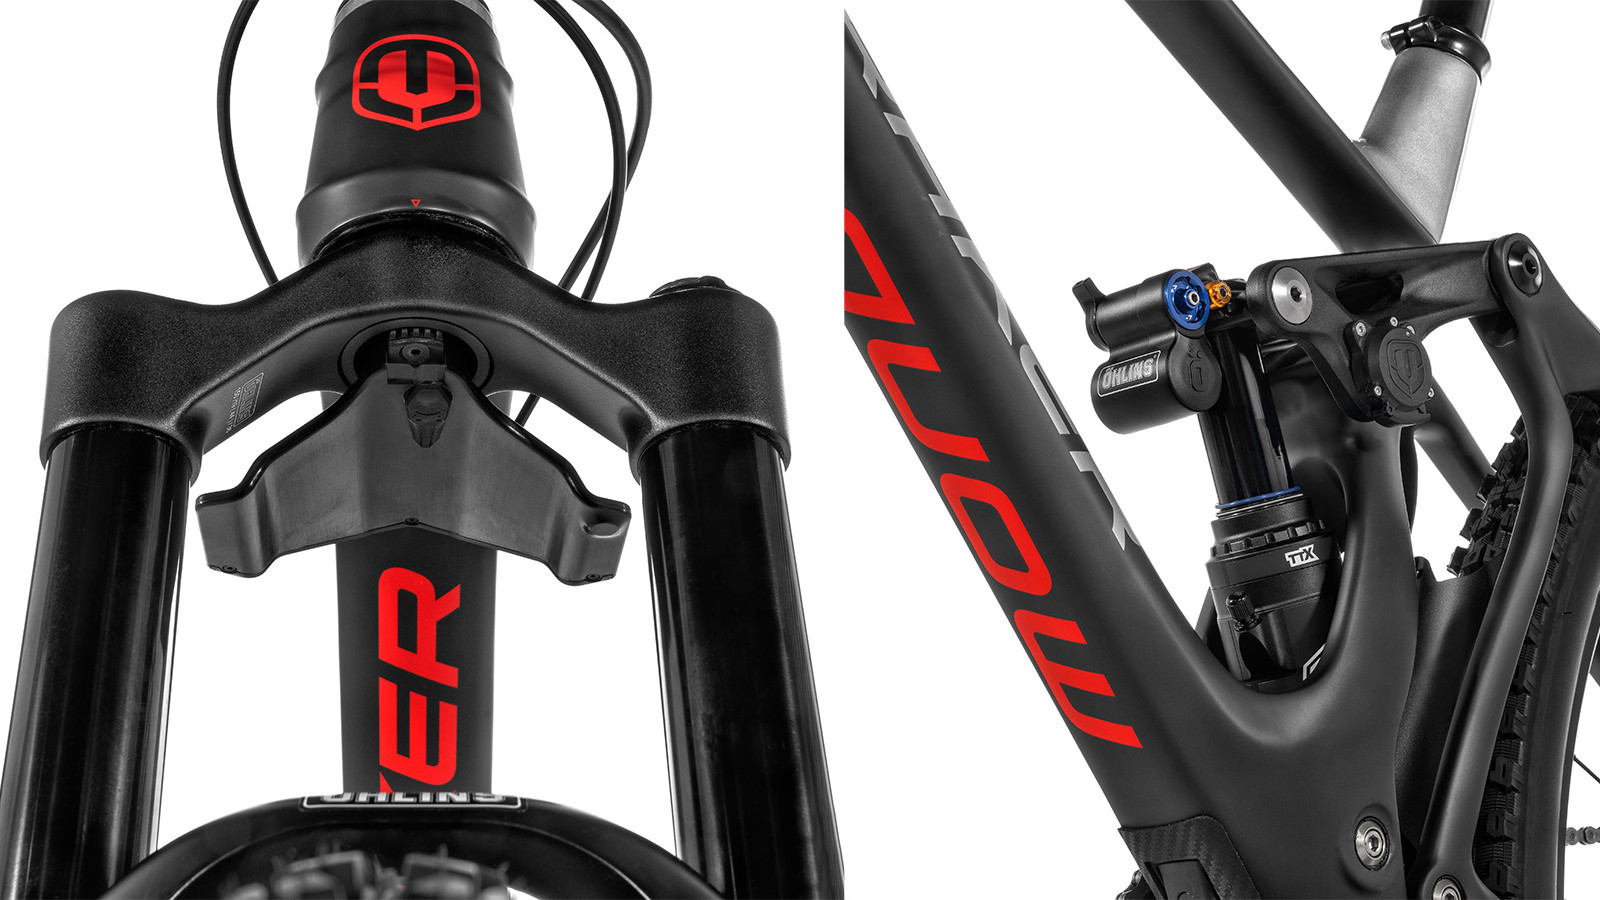 Telemetry on Stock Bikes: Mondraker Introduces MIND